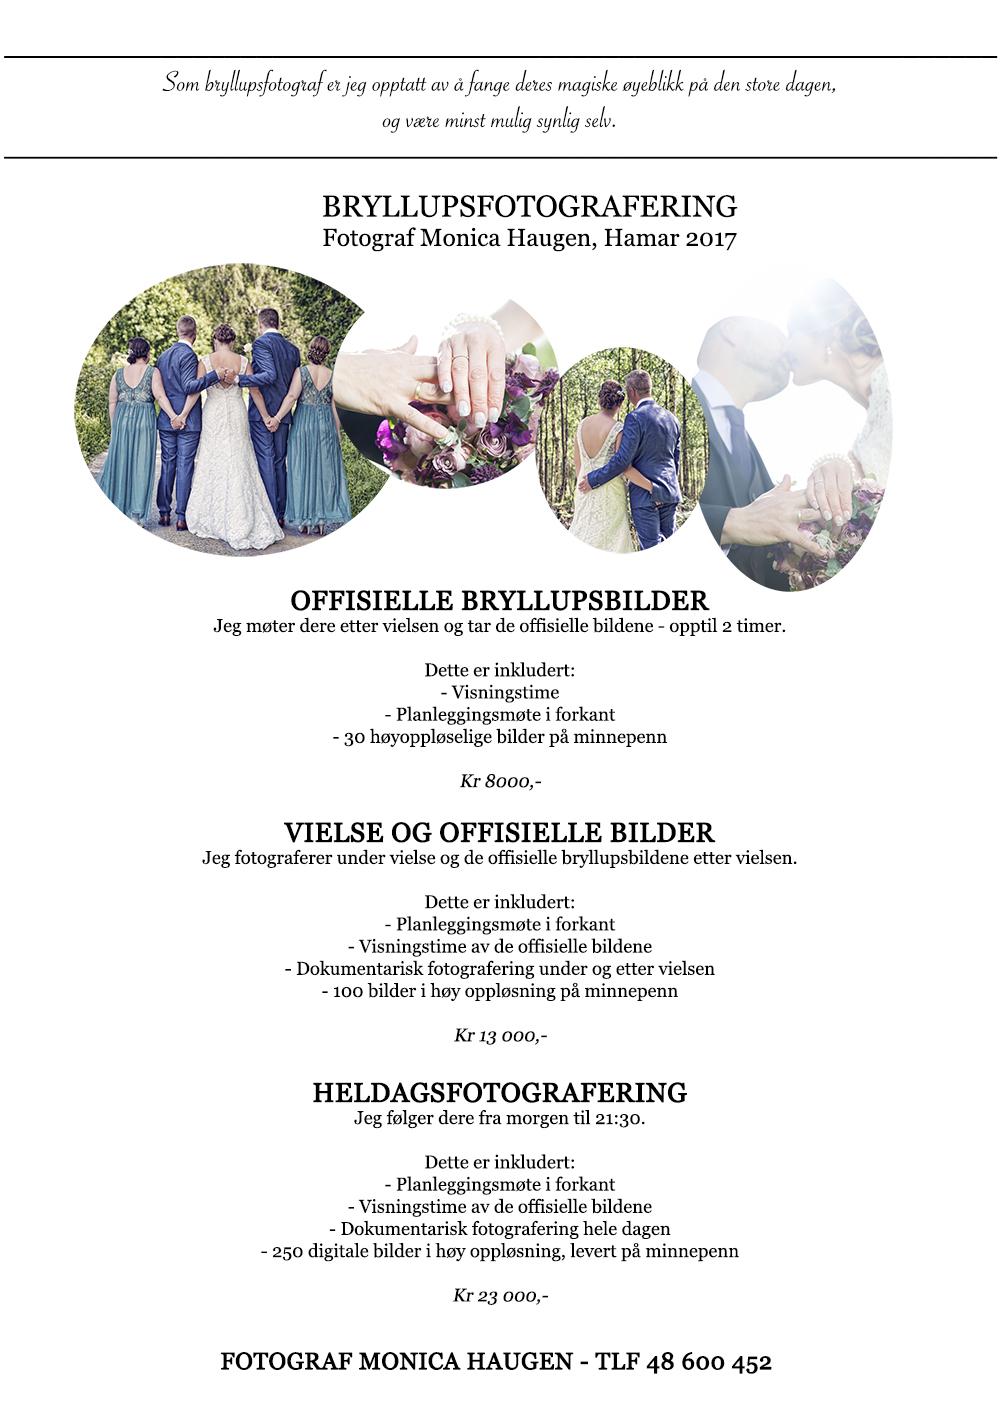 bryllupspriser